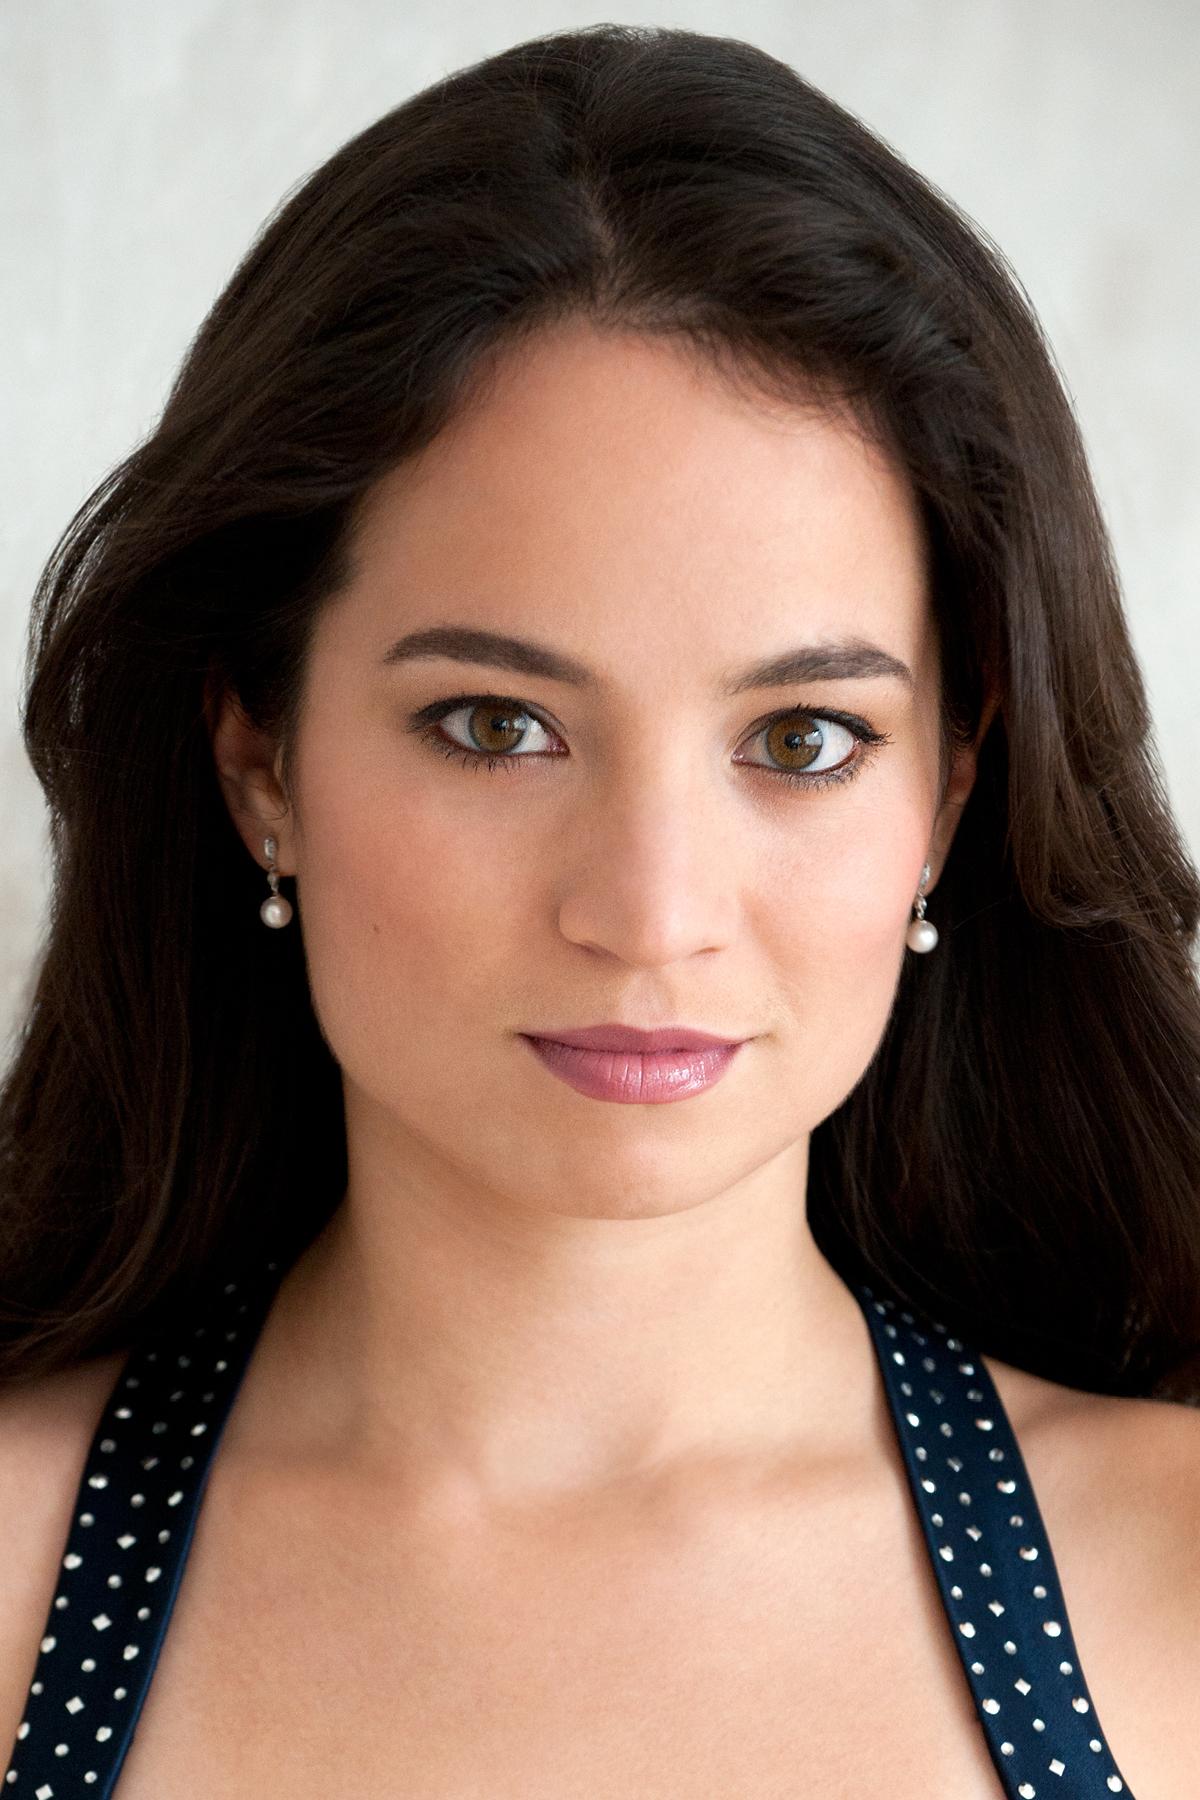 Samantha Dango Blossey